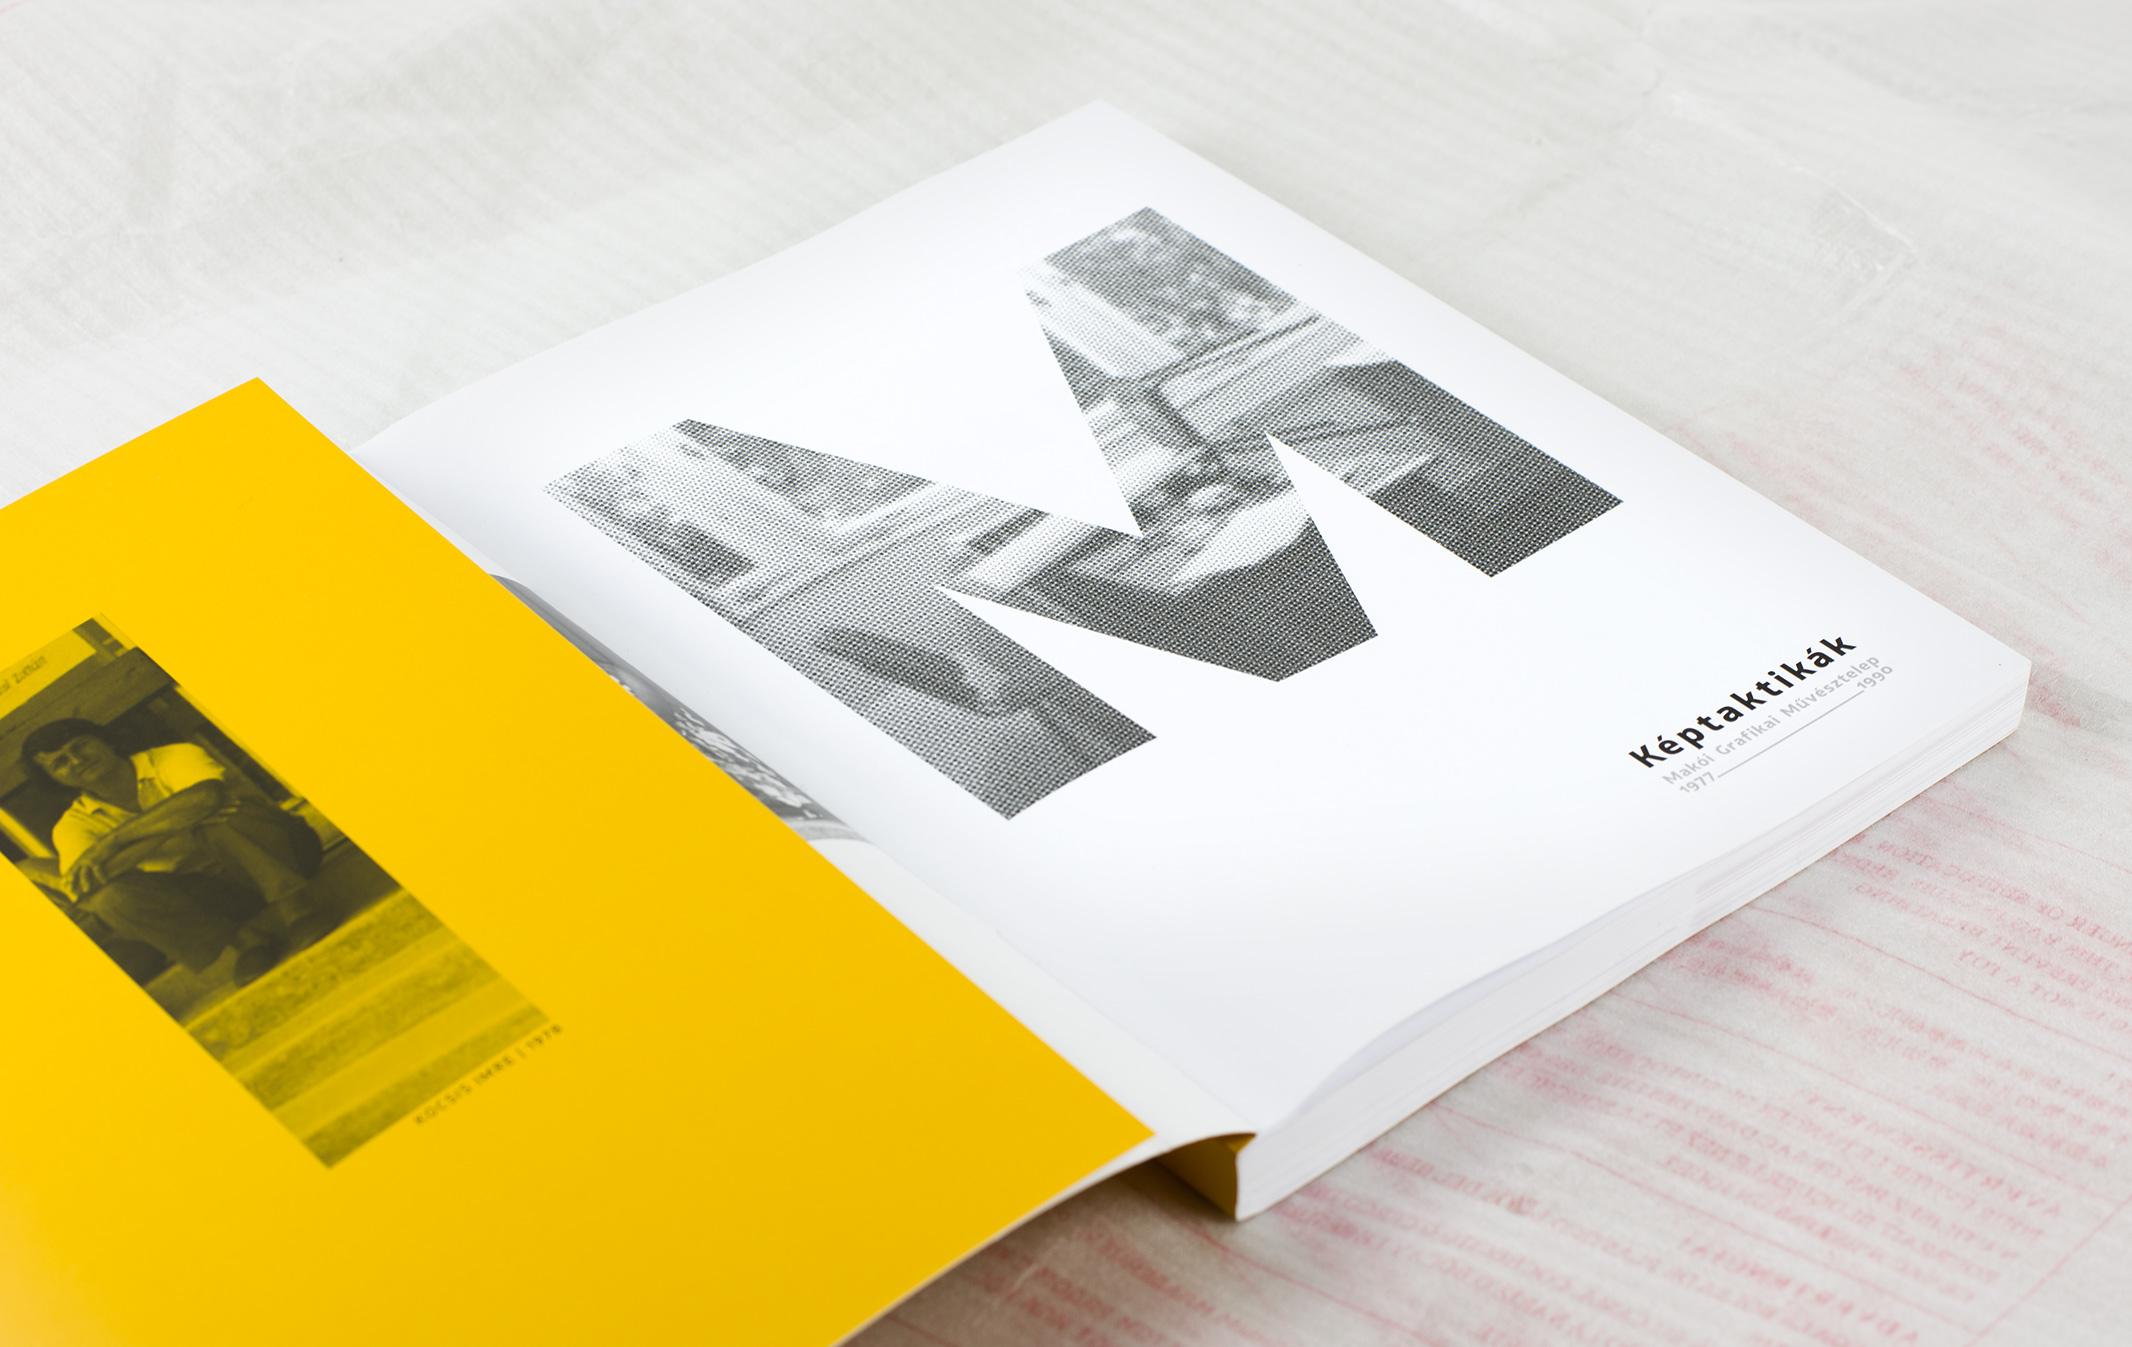 mako-book-02